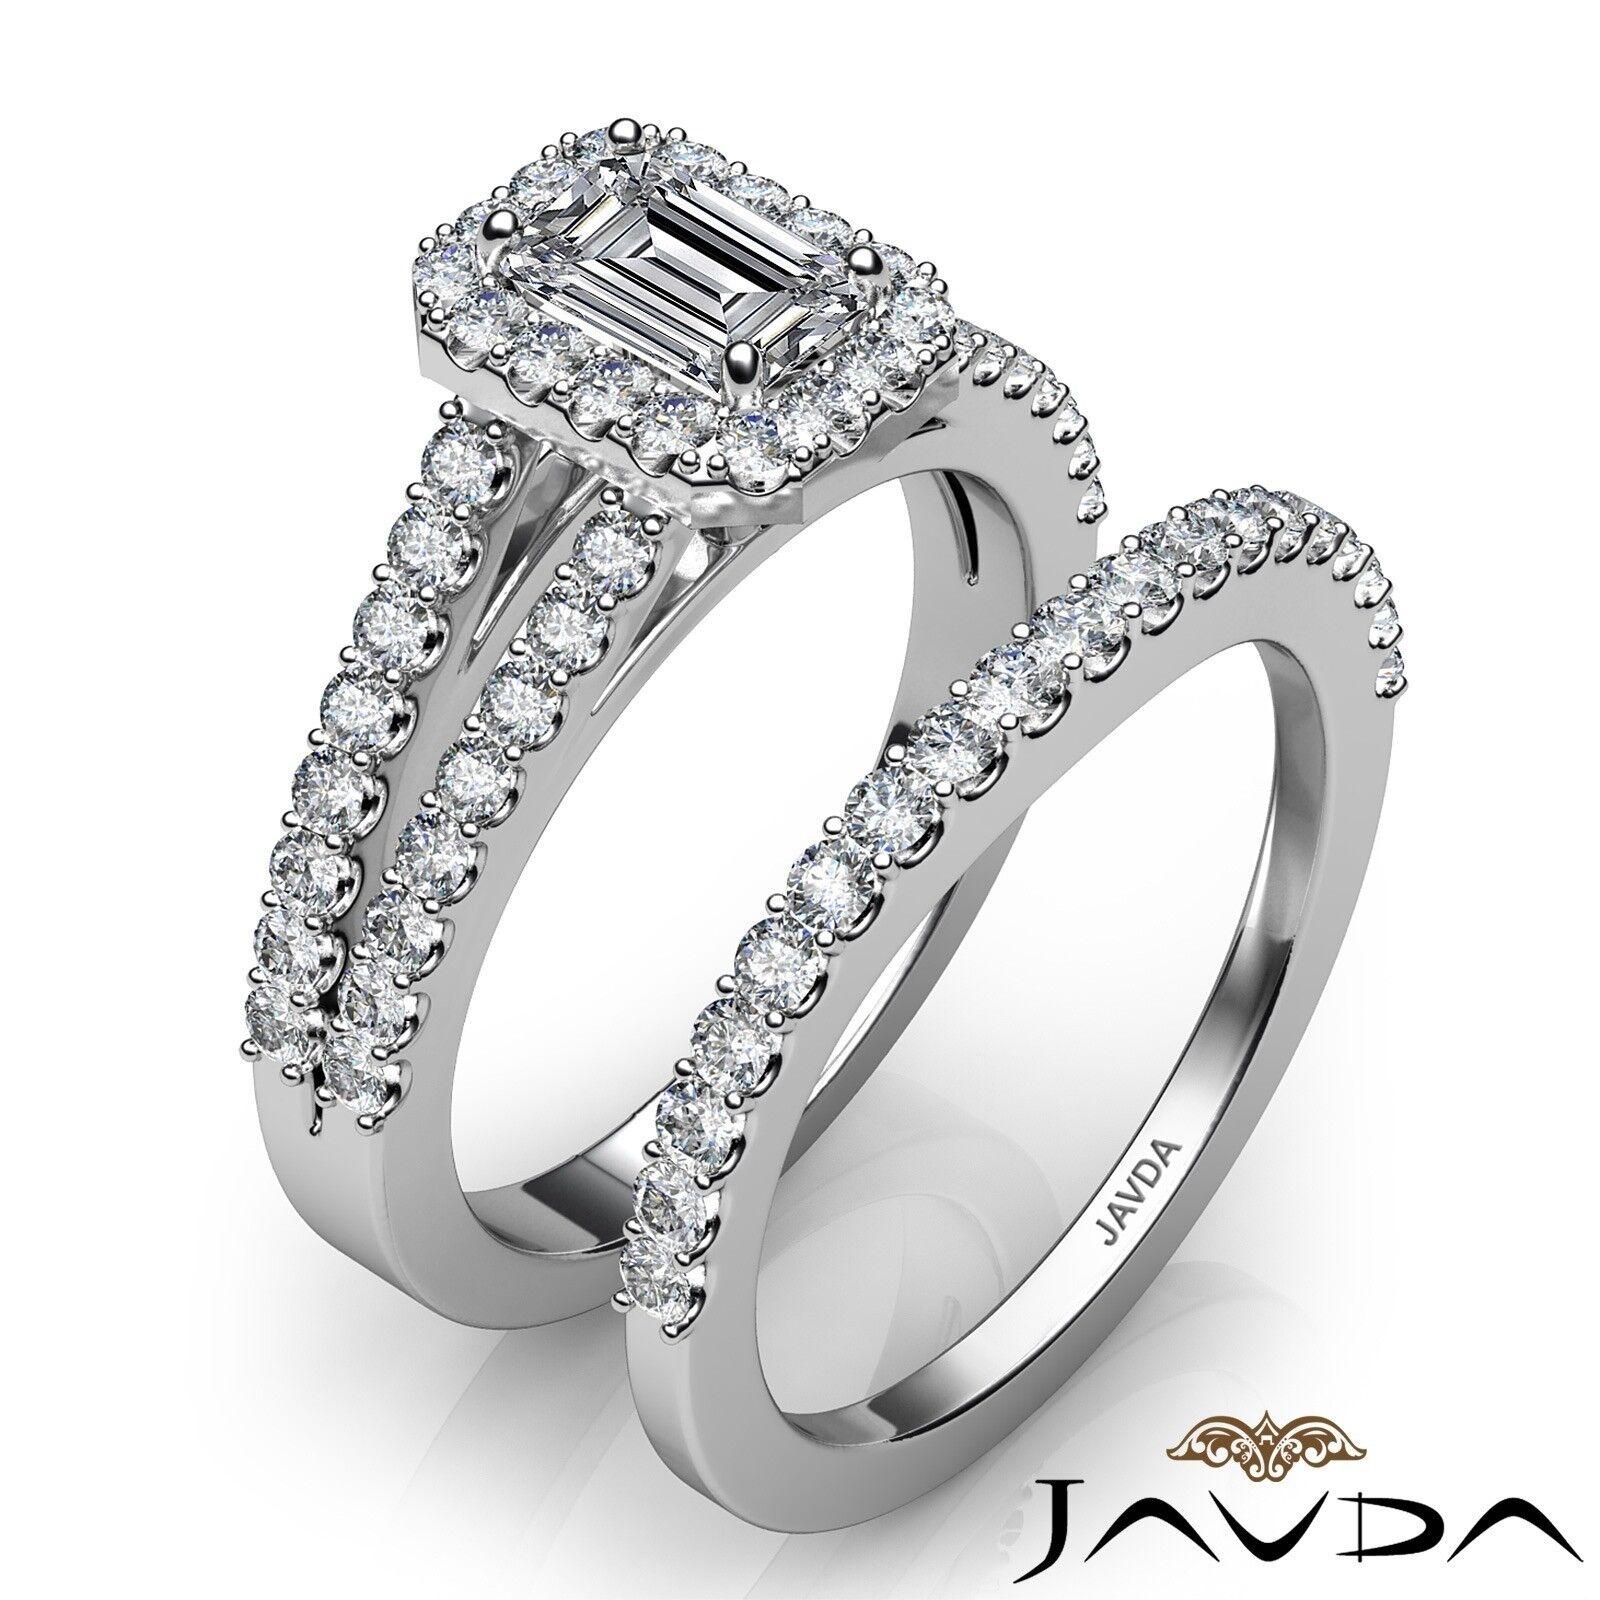 1.75ctw Halo Sidestone Bridal Emerald Diamond Engagement Ring GIA H-VS2 W Gold 2